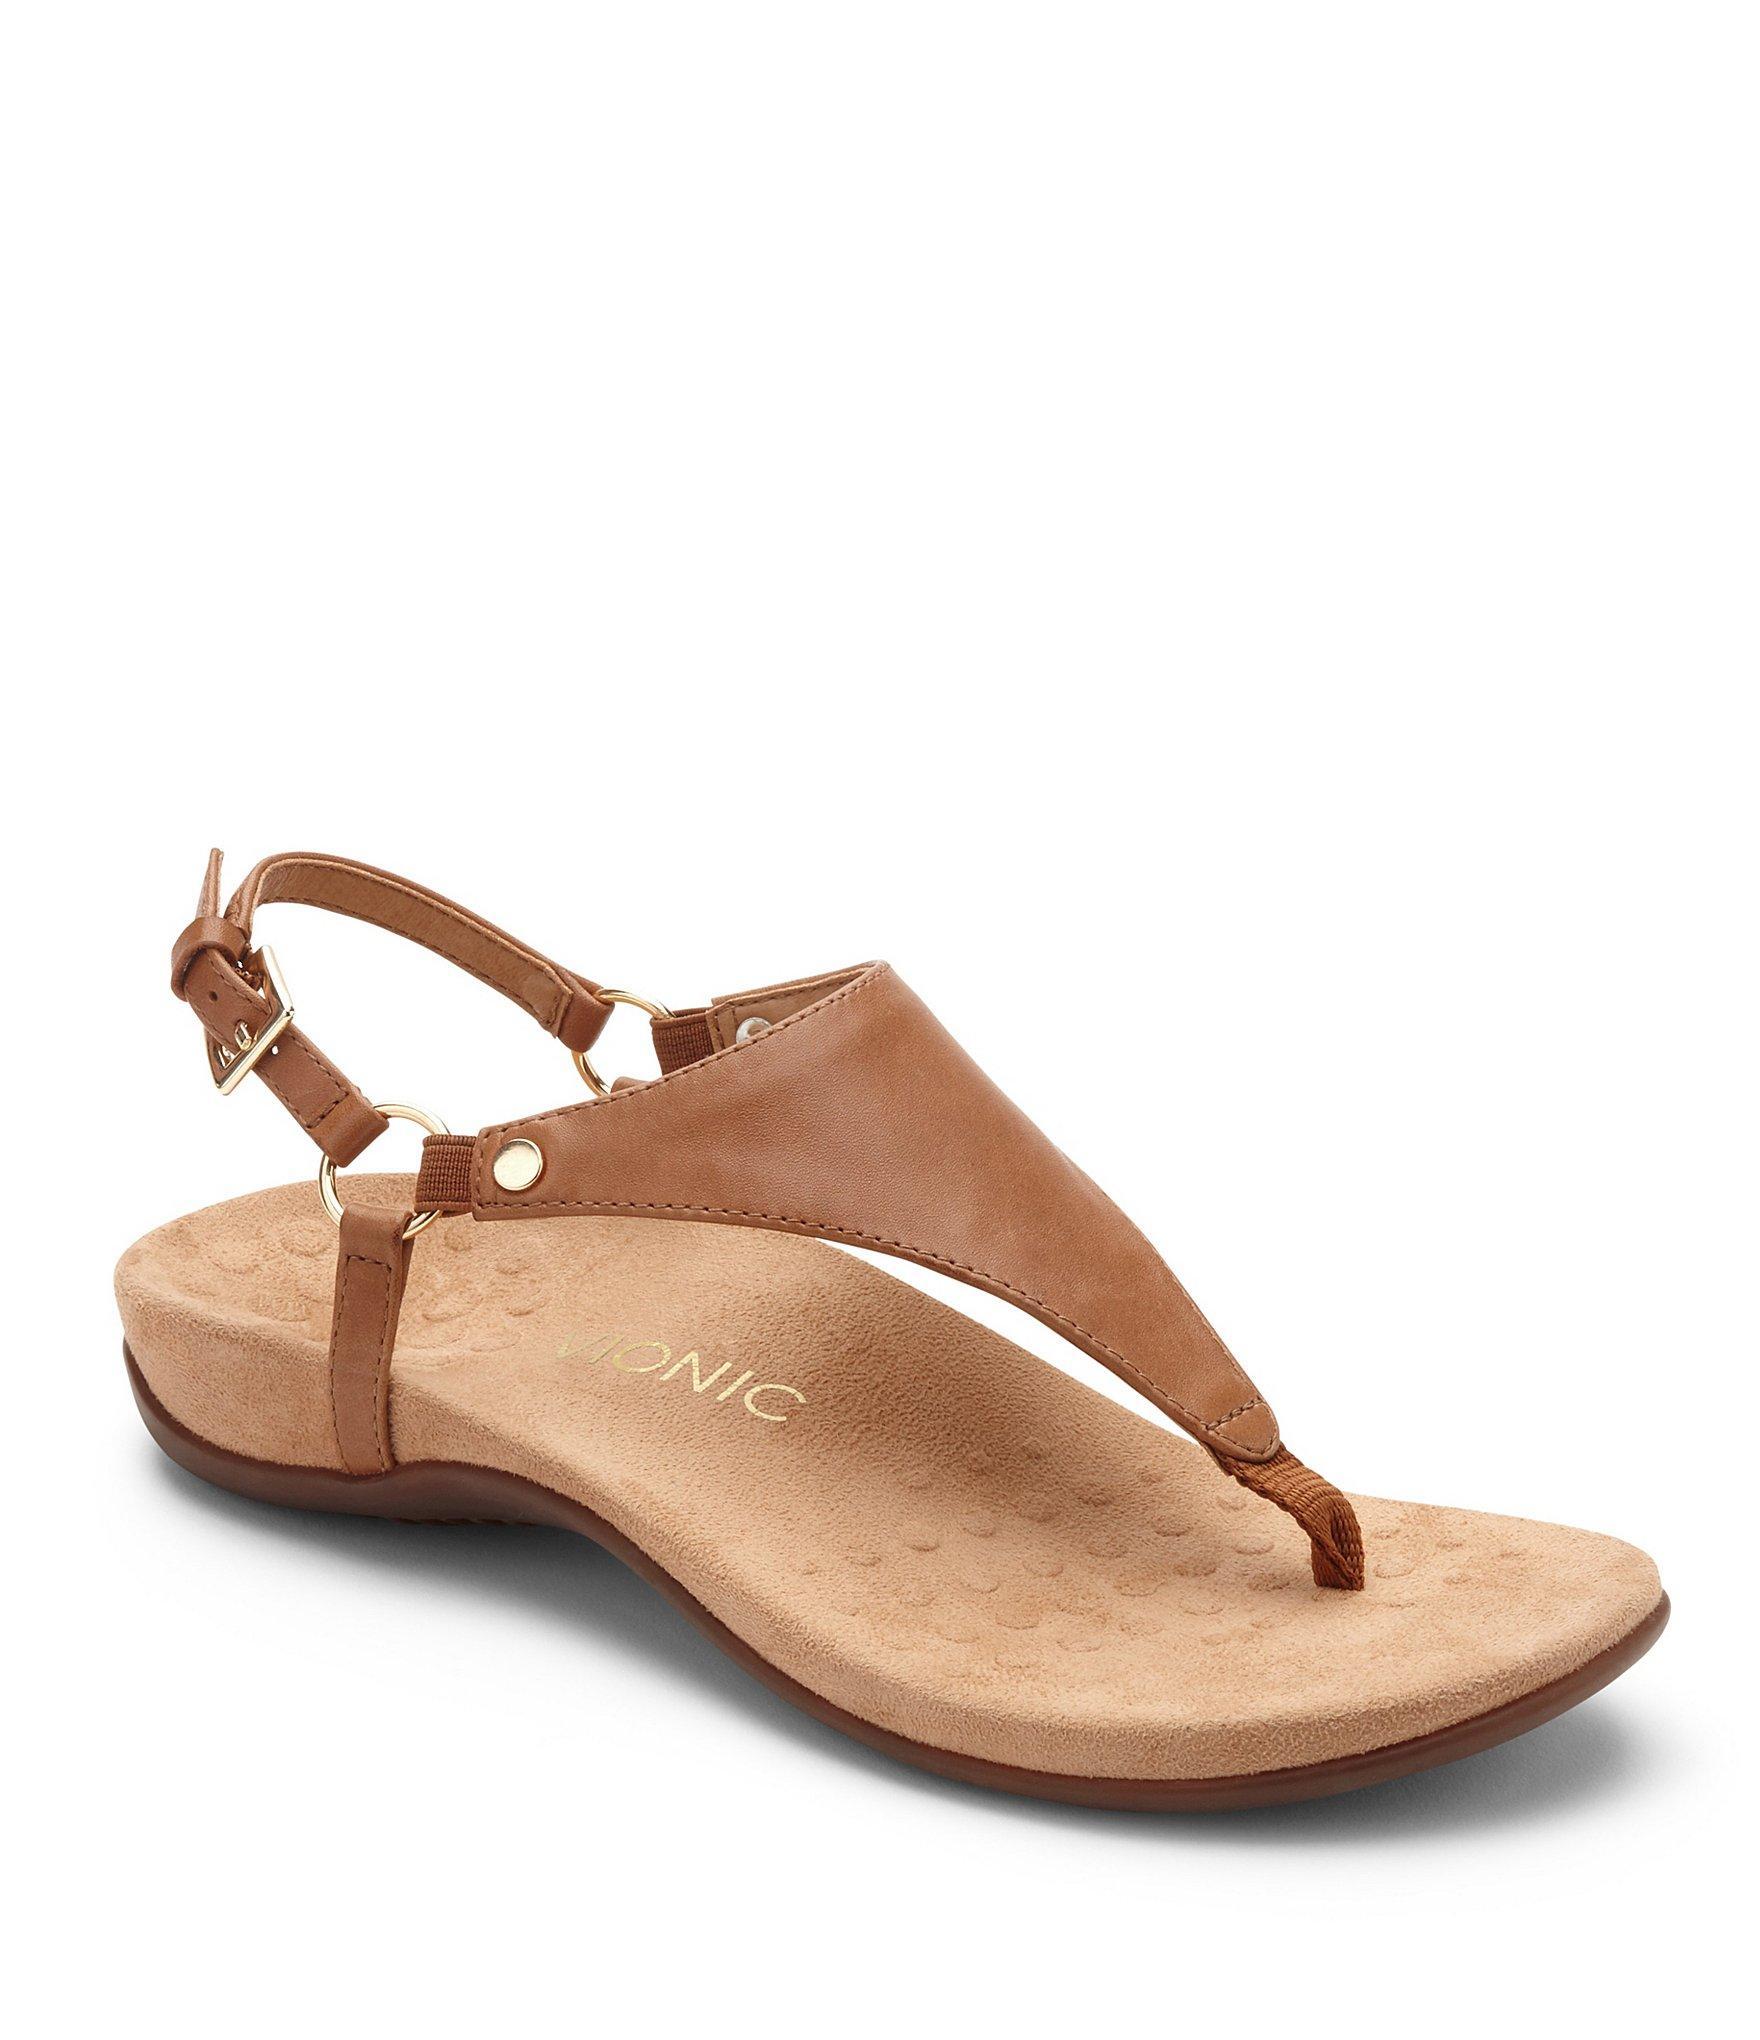 68010b5f0eb1 Lyst - Vionic Kirra Leather Thong Sandals in Brown